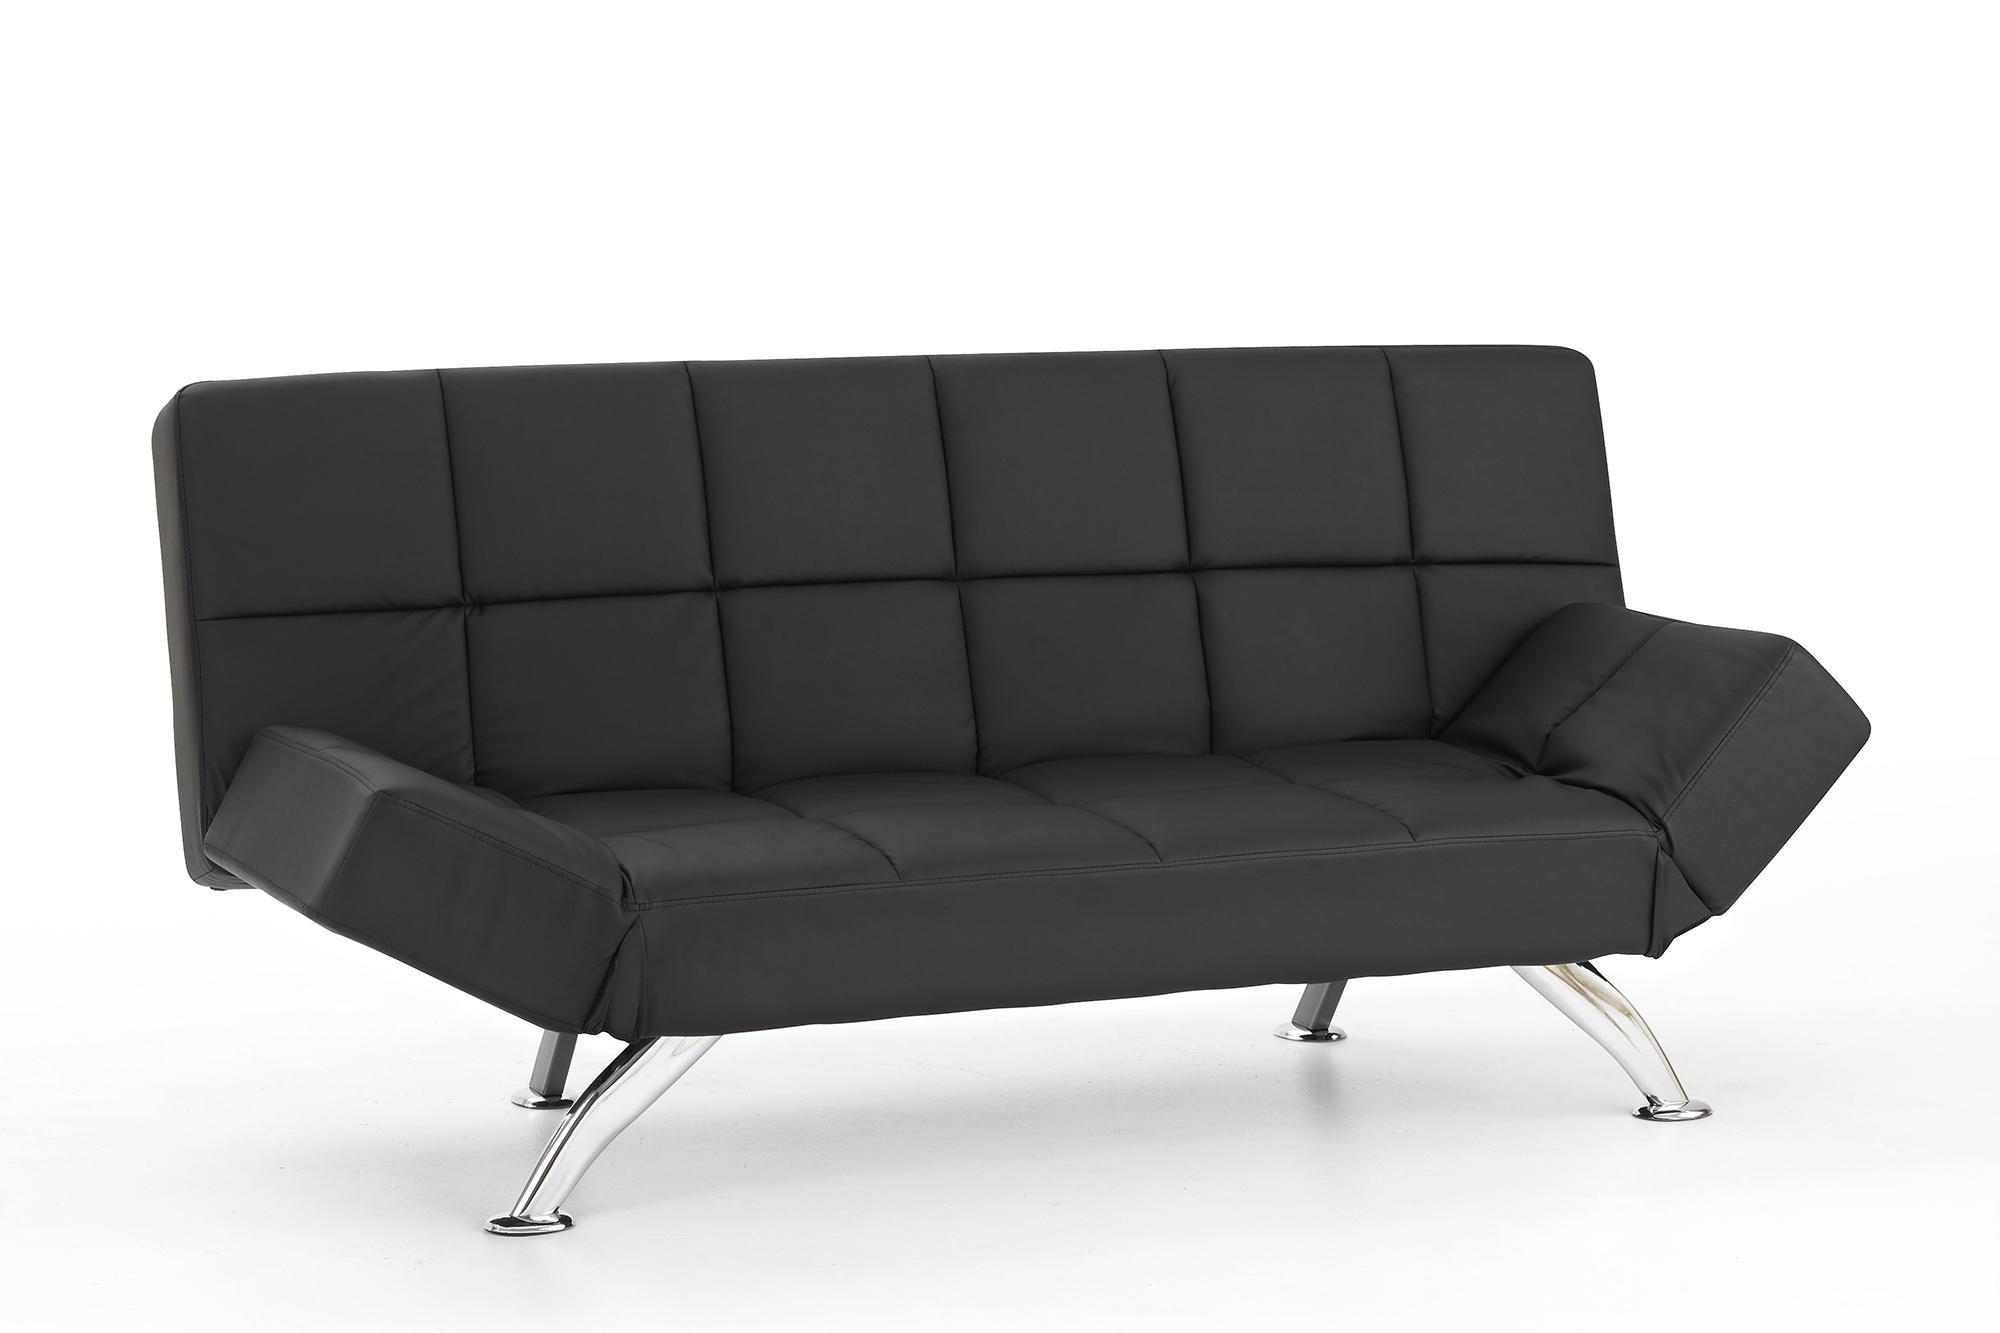 Best leather sofa deals uk